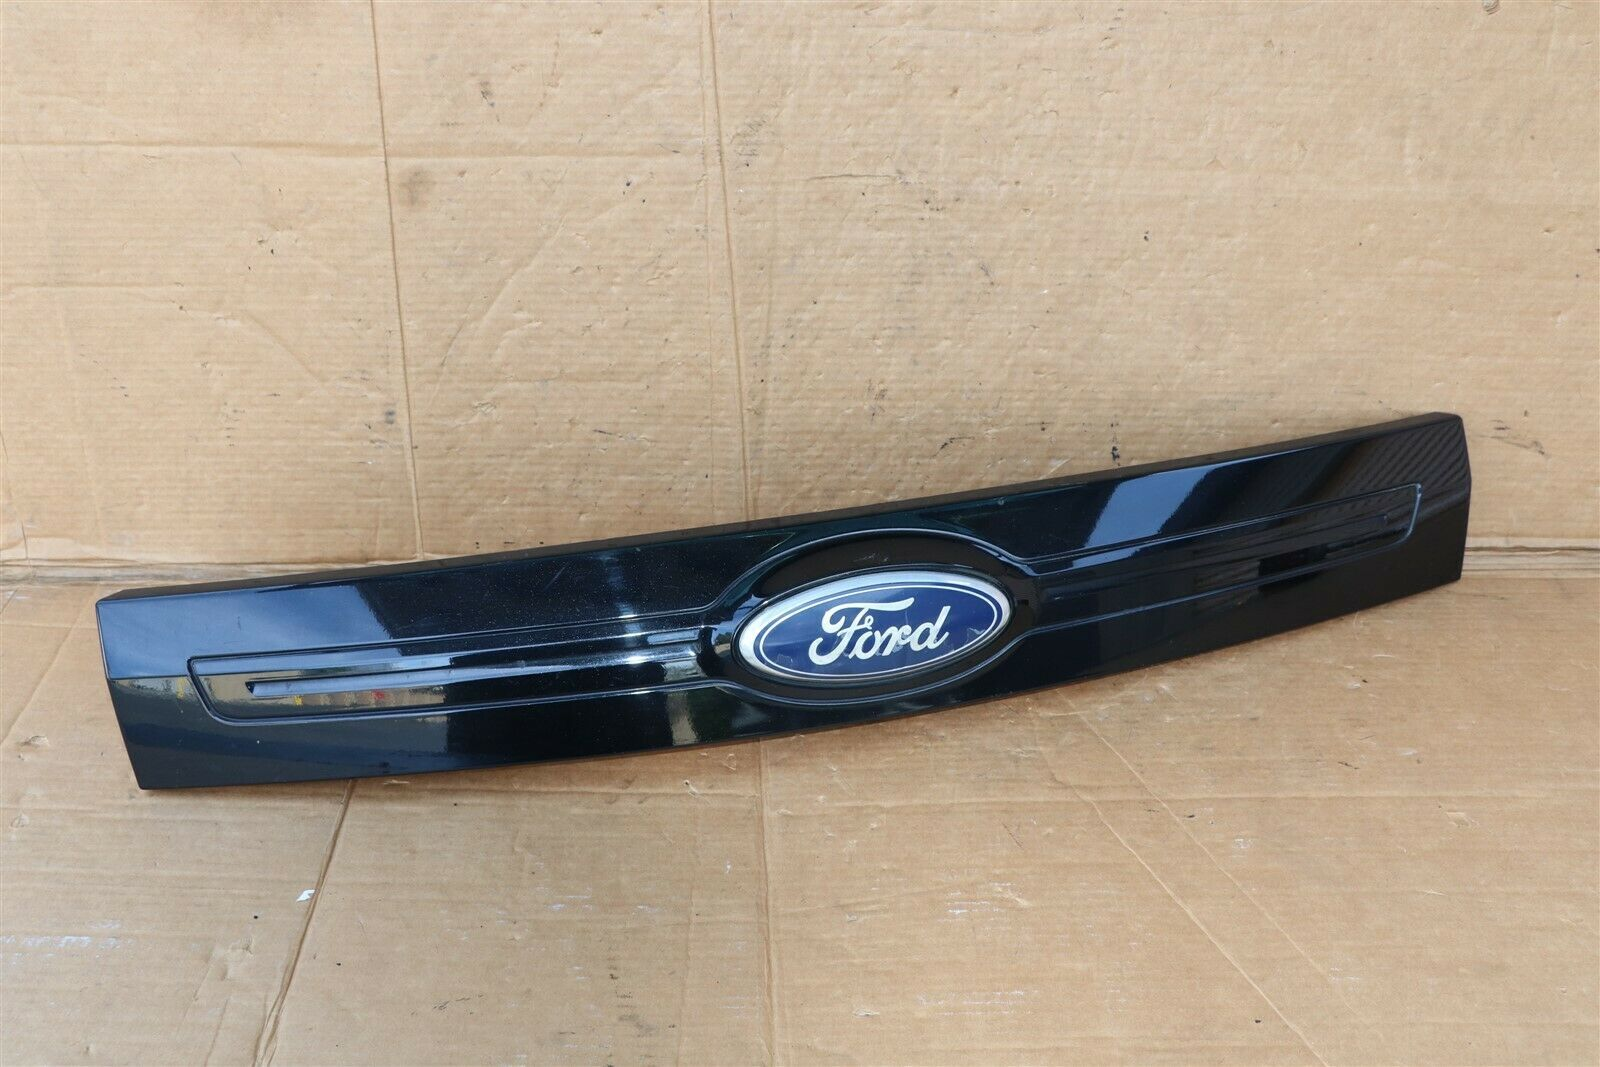 11-14 Ford Edge Rear Liftgate Tailgate Hatch Handle Trim W/ Camera